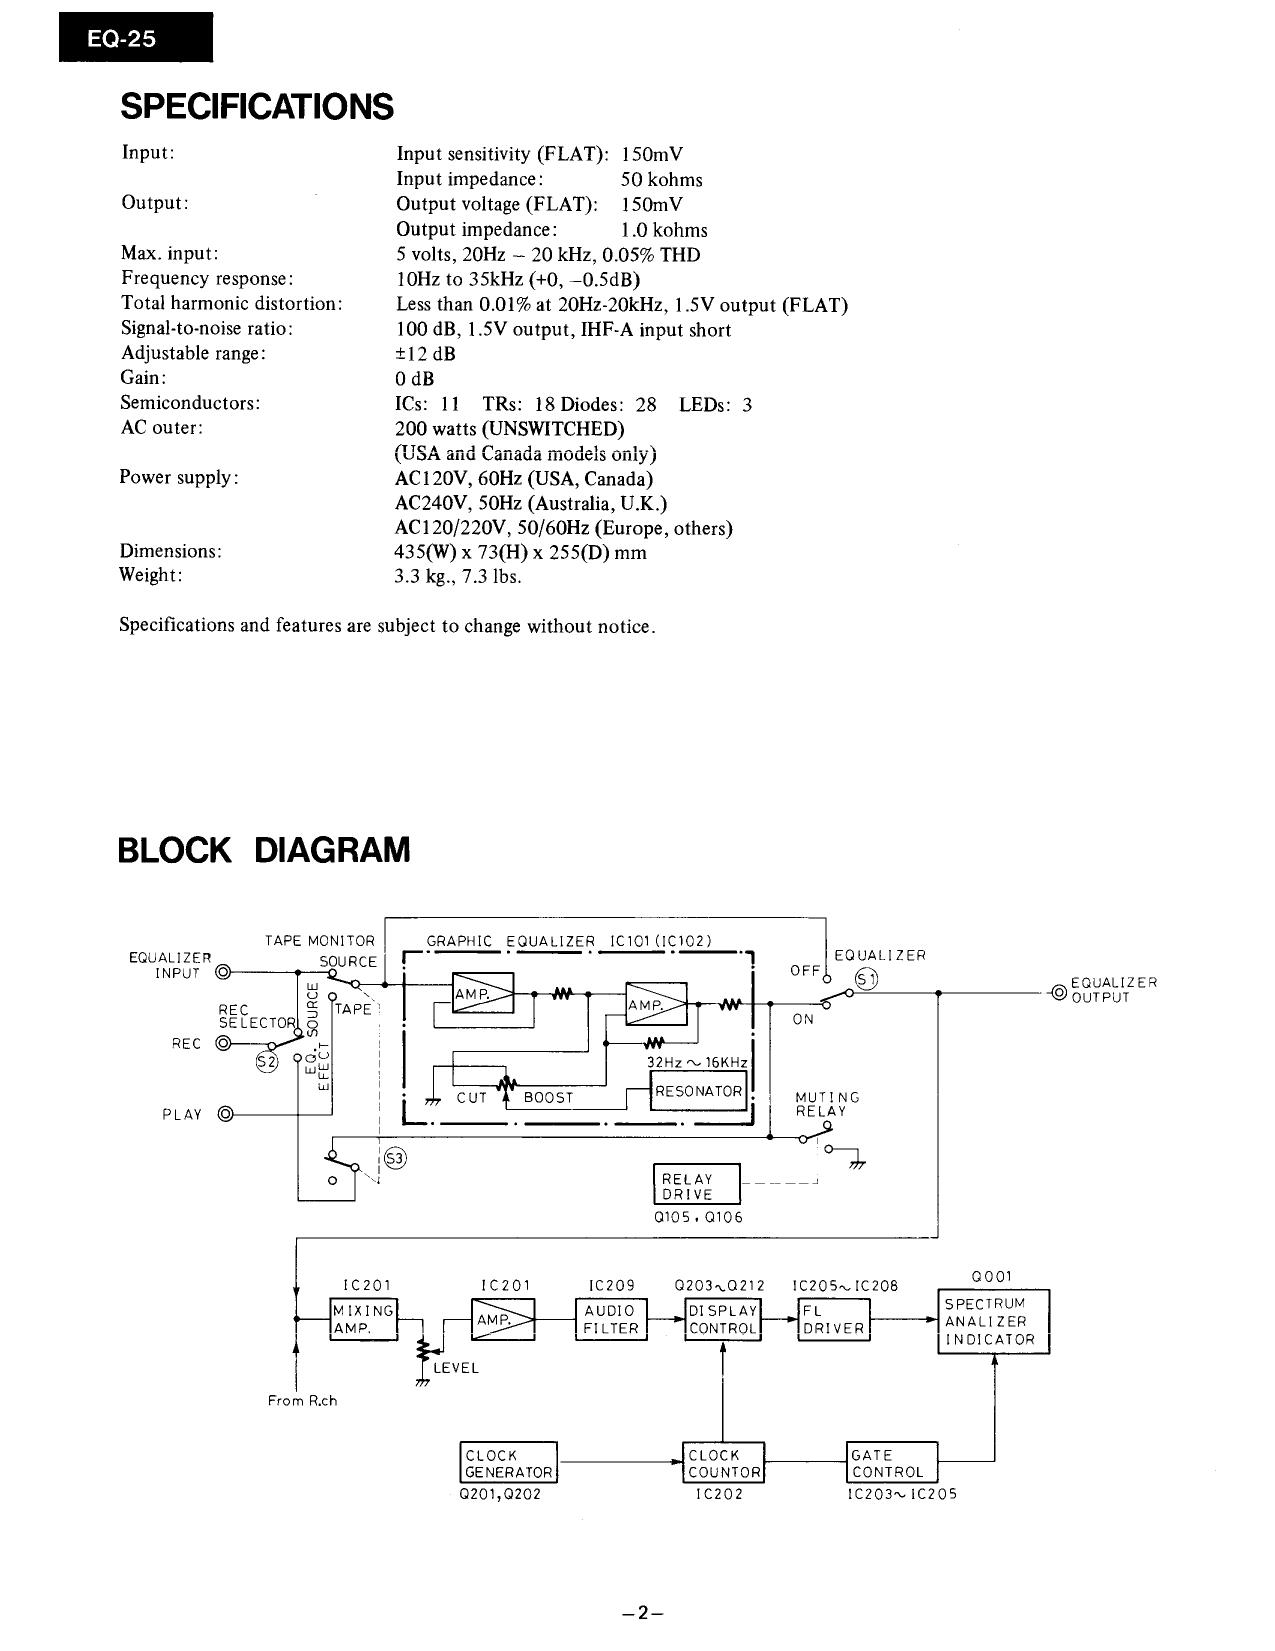 Onkyo Eq25 Wiring Diagram Schematic Diagrams 3 Way Switch Block Automotive U2022 Electrical For Dummies